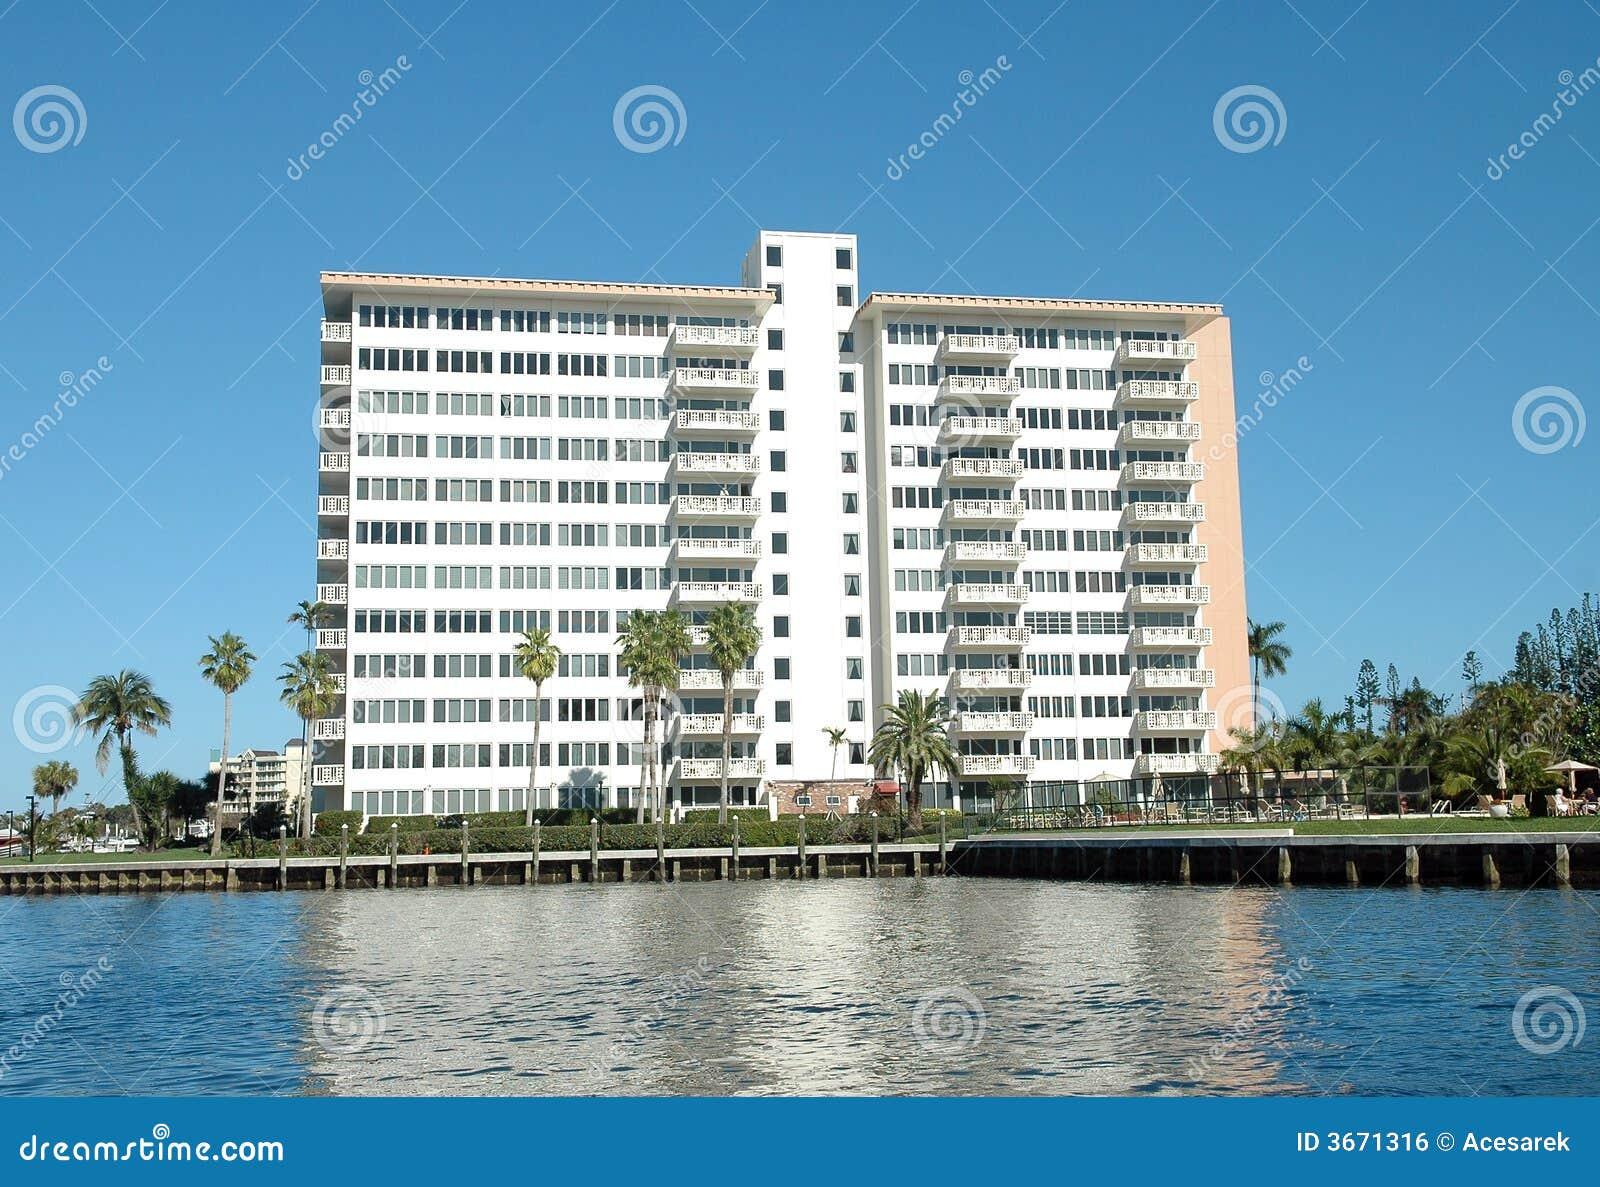 generic apartment building in florida stock photo - image: 43540293